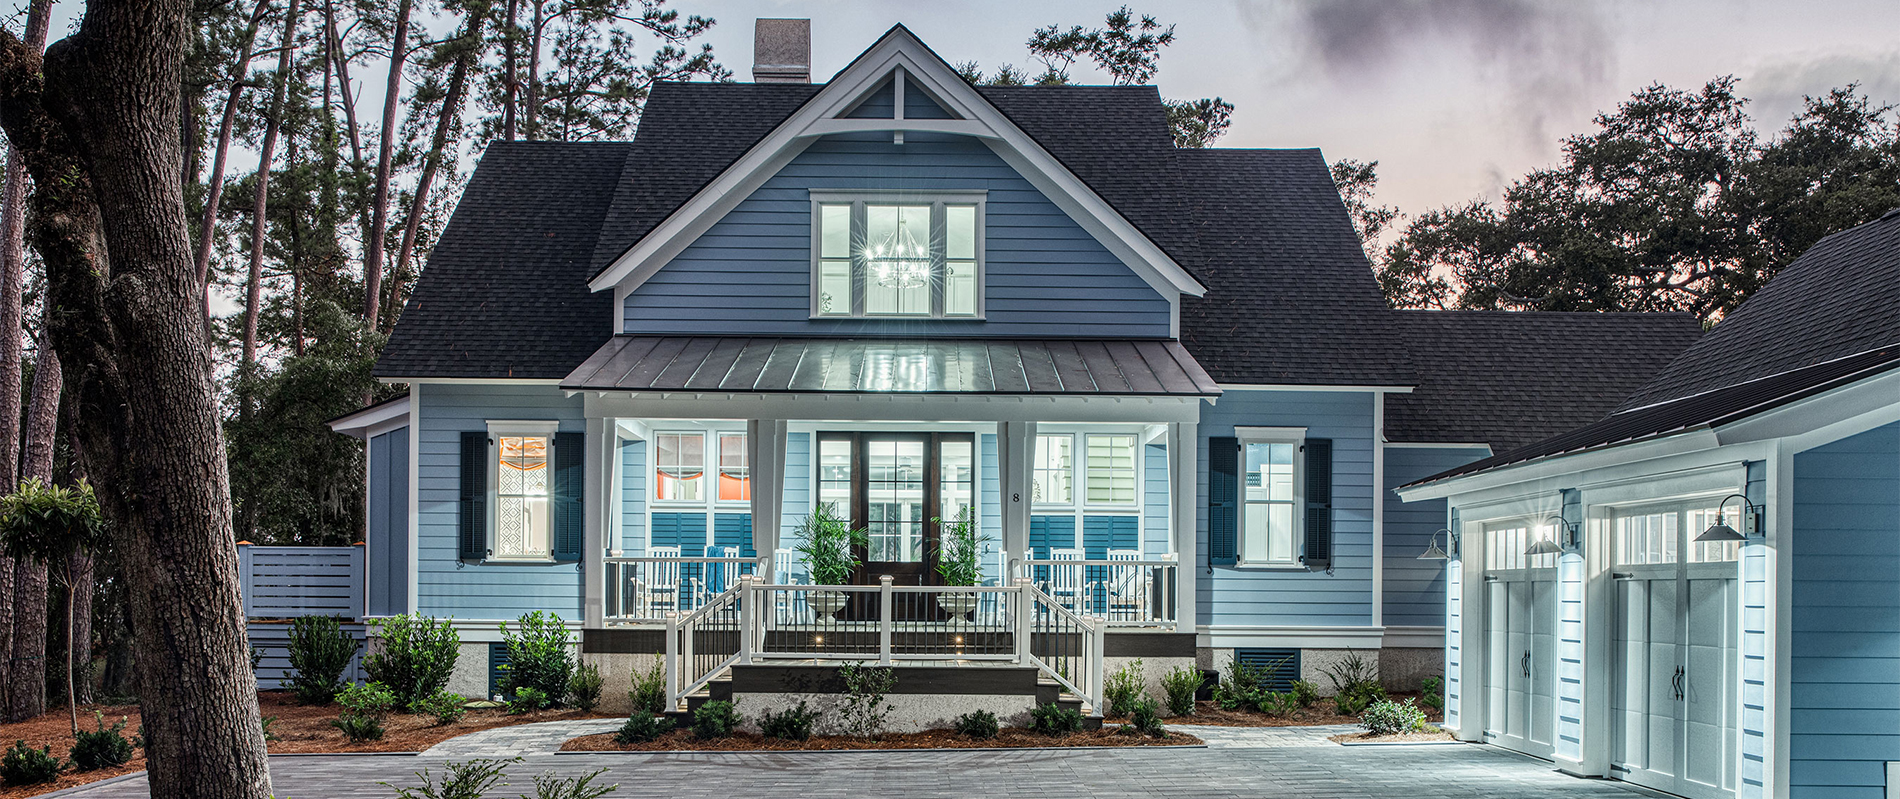 where is the hgtv dream home 2020